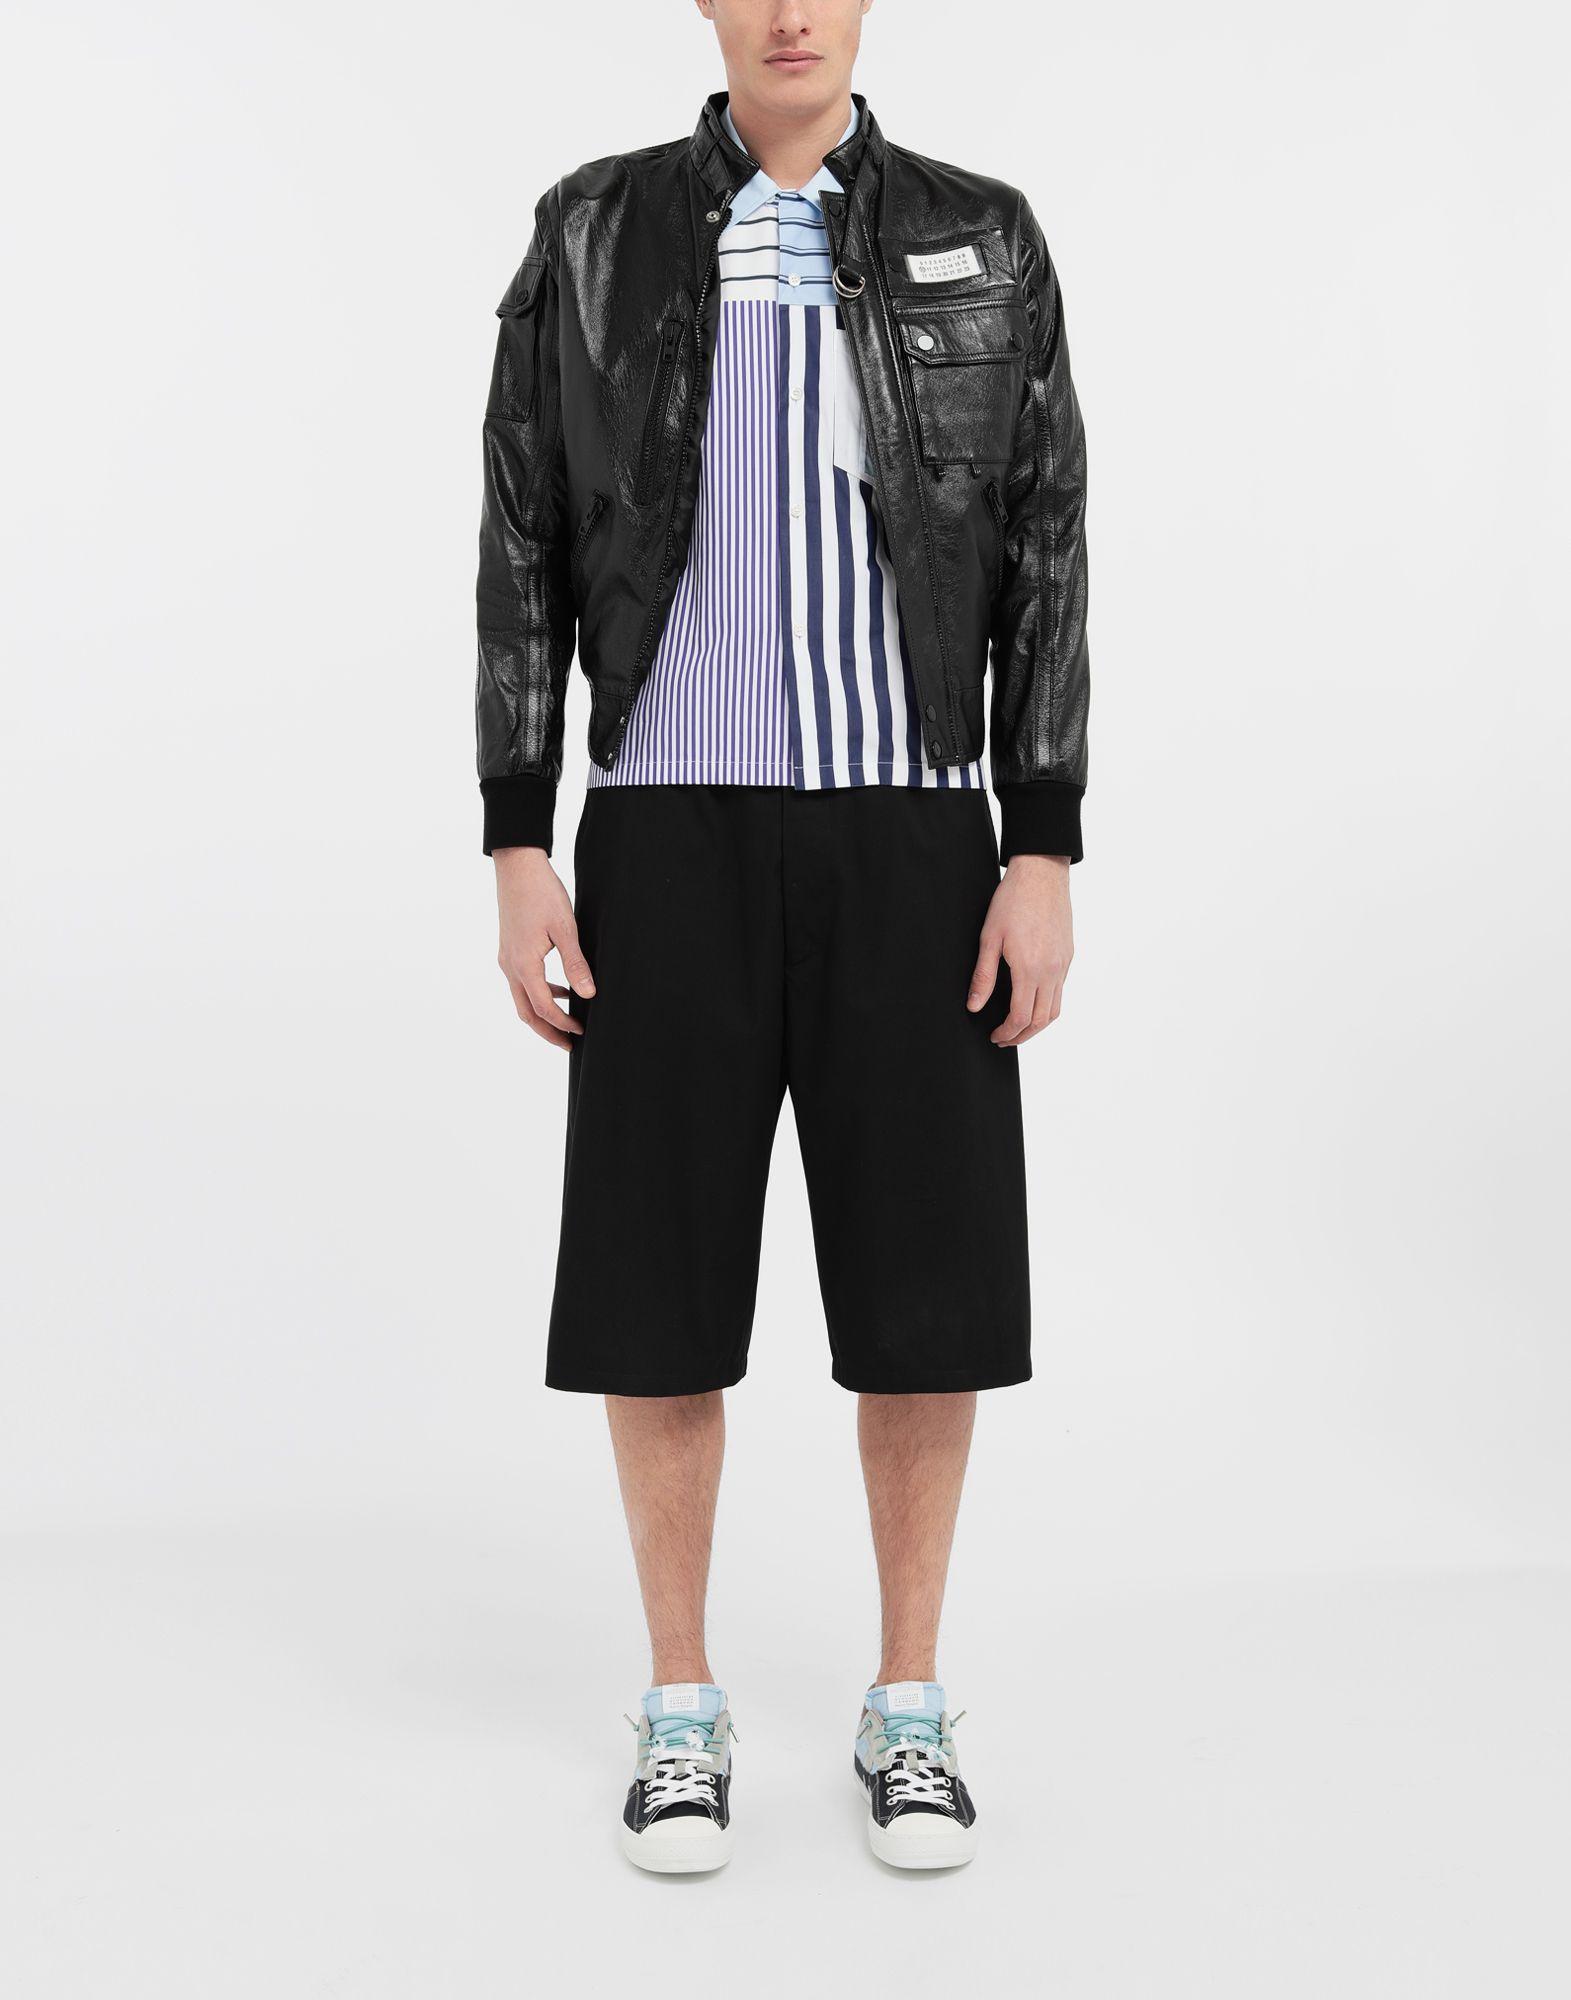 MAISON MARGIELA Asymmetric striped shirt Short sleeve shirt Man d